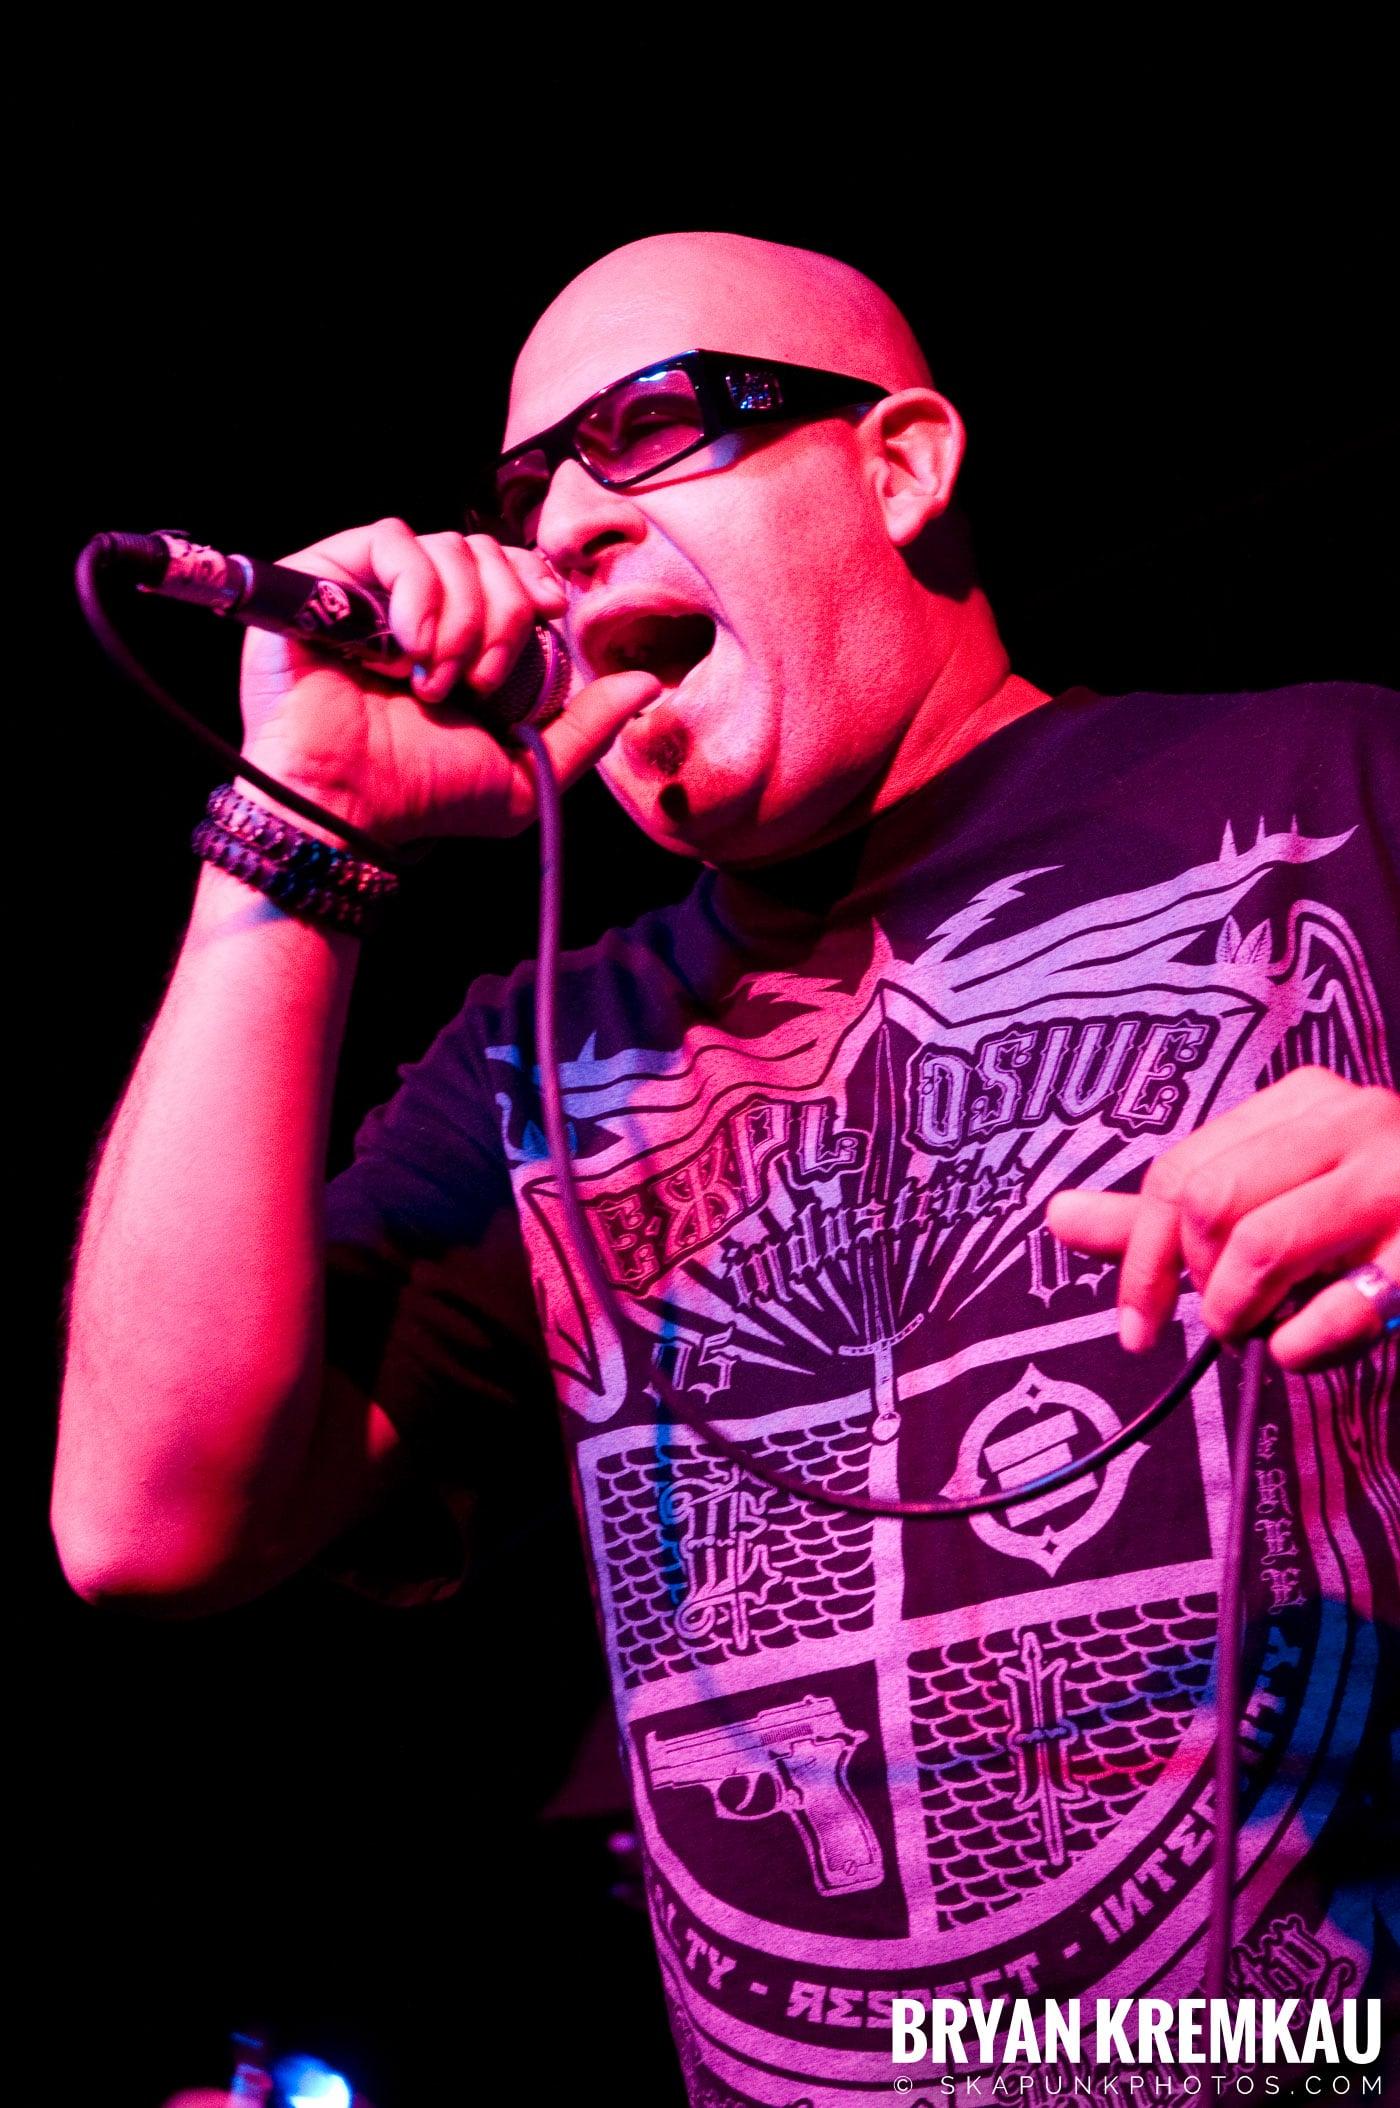 Voodoo Glow Skulls (Ska is Dead Tour) @ Starland Ballroom, Sayreville, NJ - 11.15.09 (9)